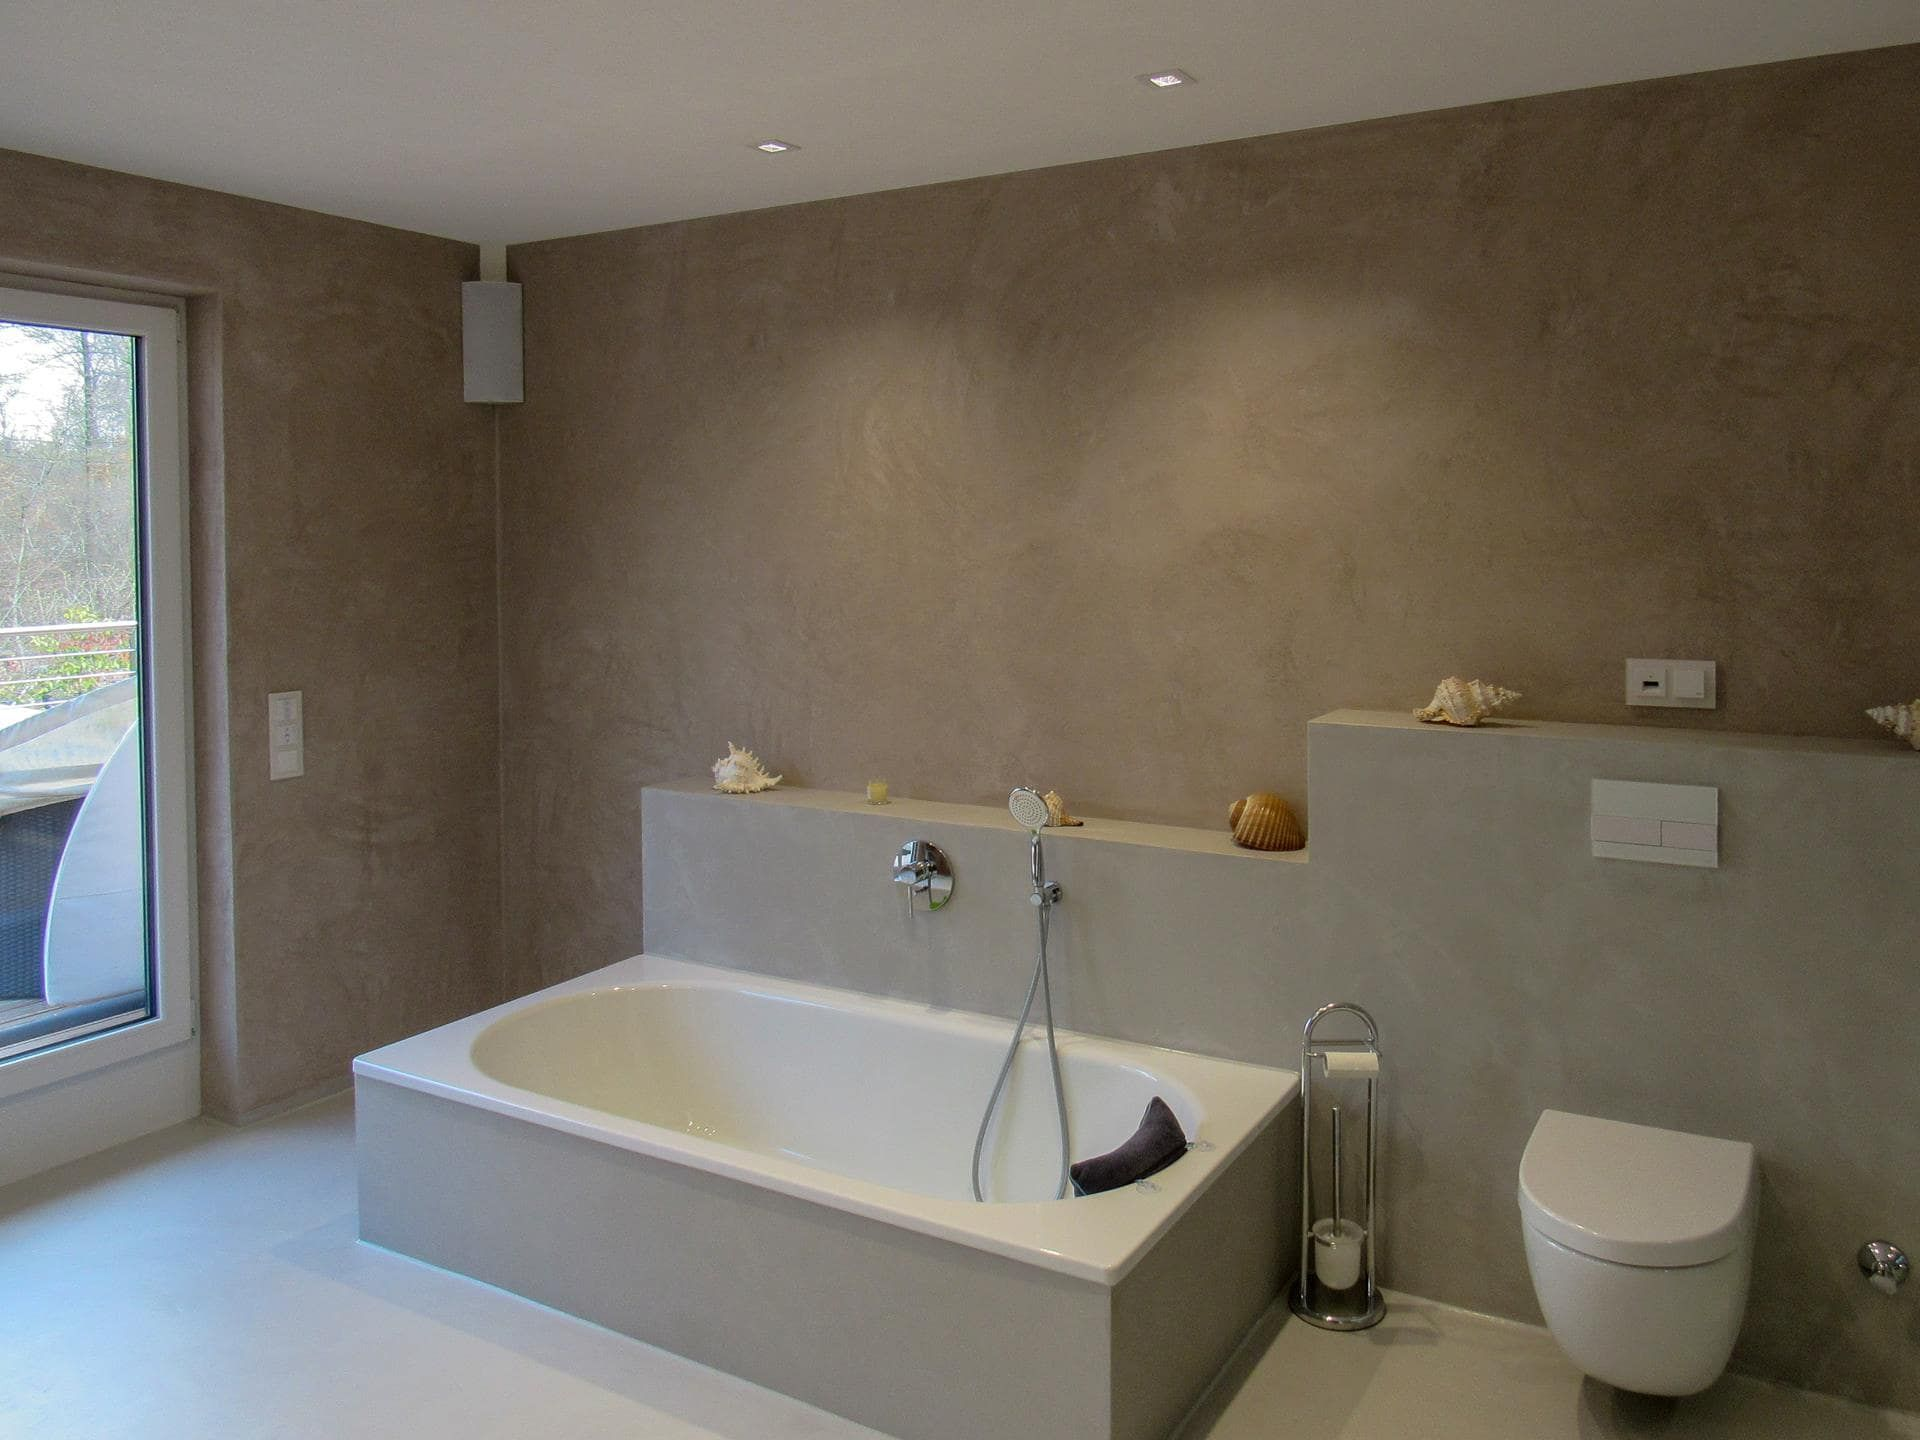 Glamora Fugenlos Badezimmer Design Tapeten In 2020 Fugenloses Bad Badezimmer Design Bad Design